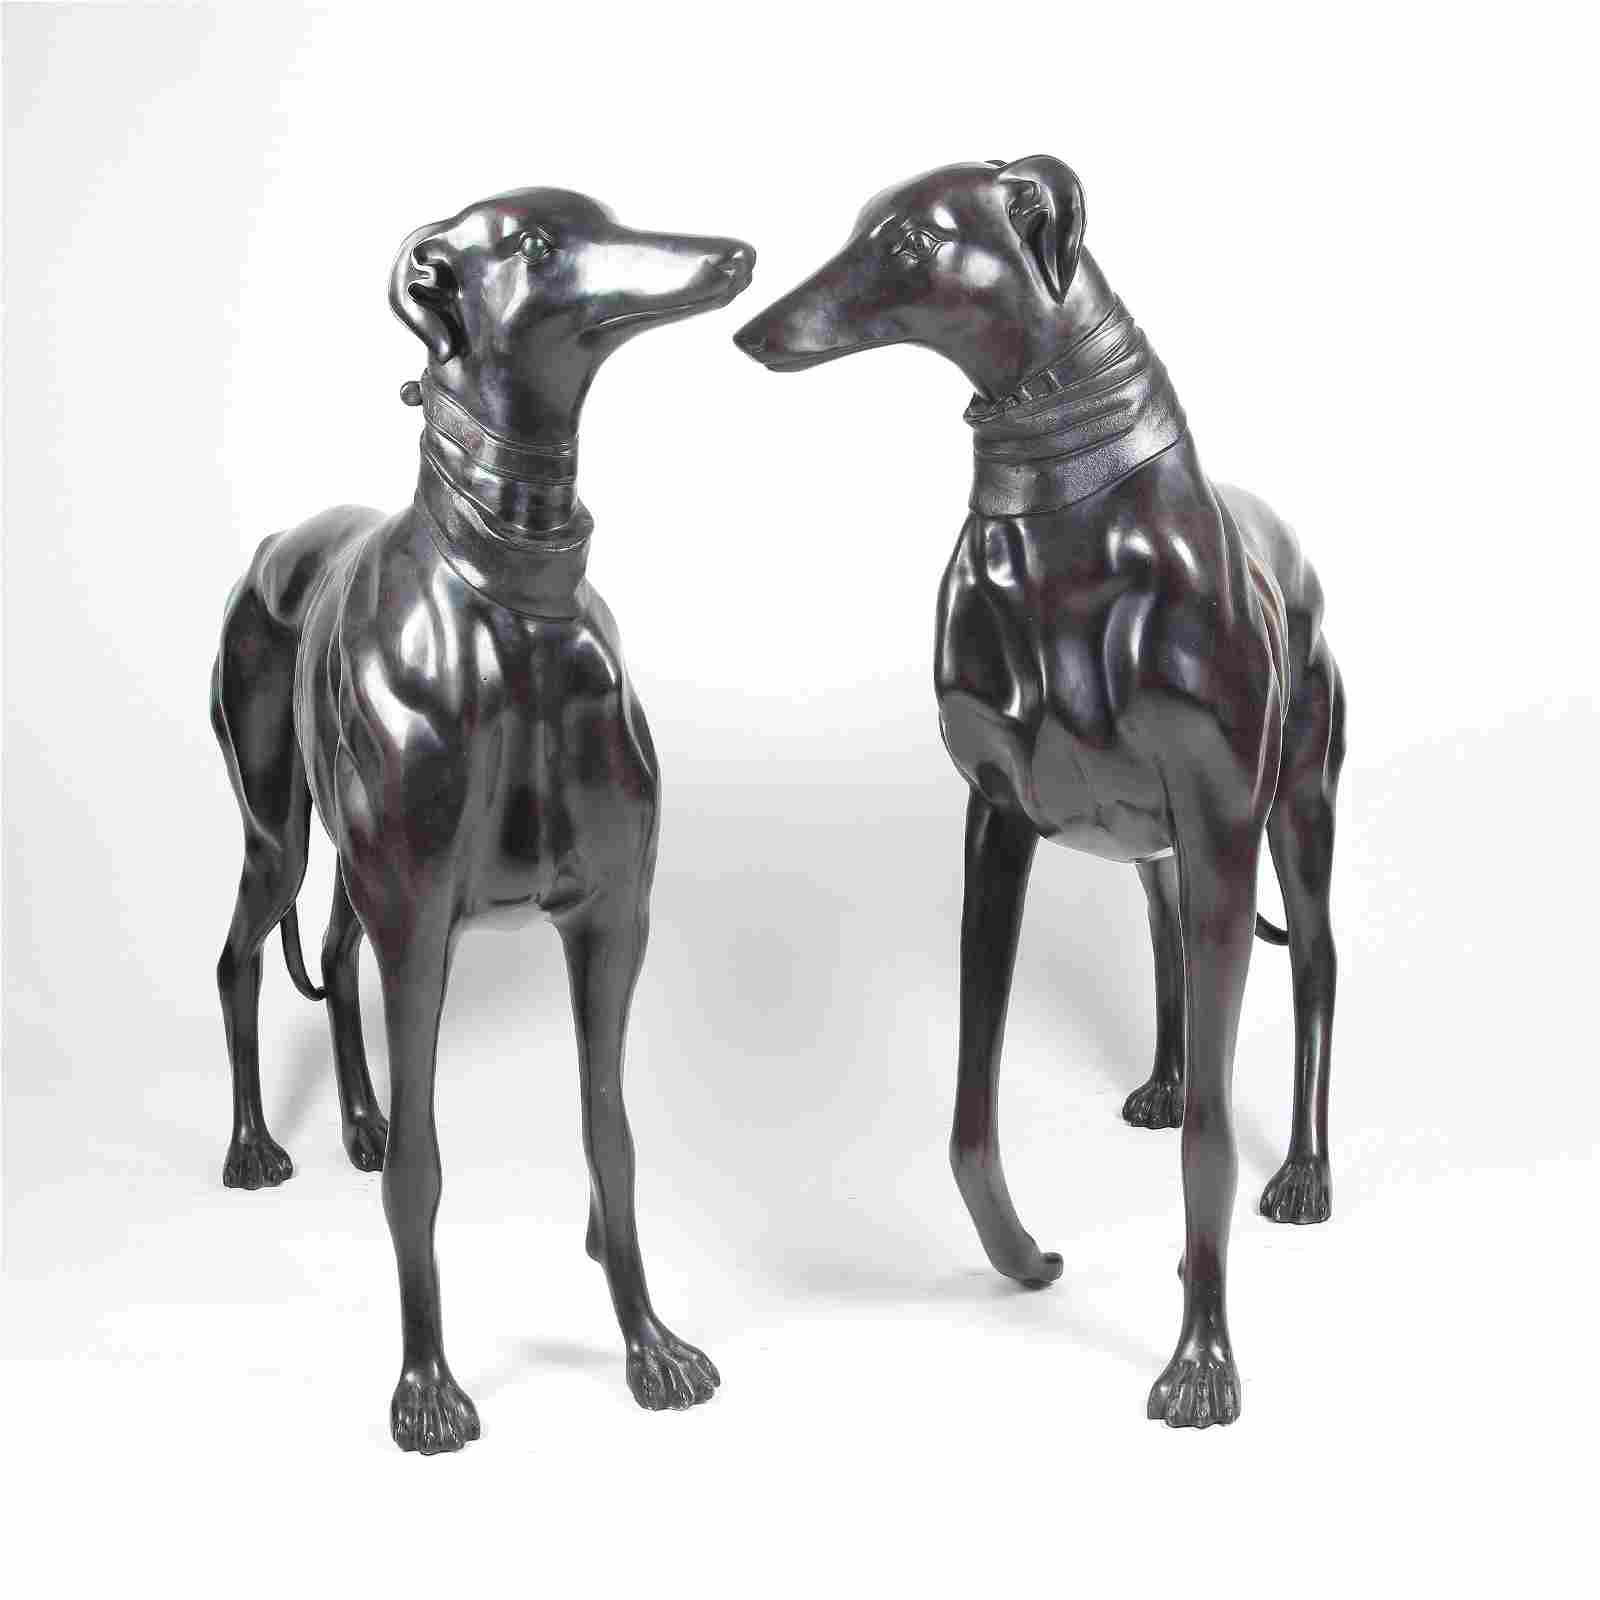 A pair of patinated bronze sculpture of a greyhound